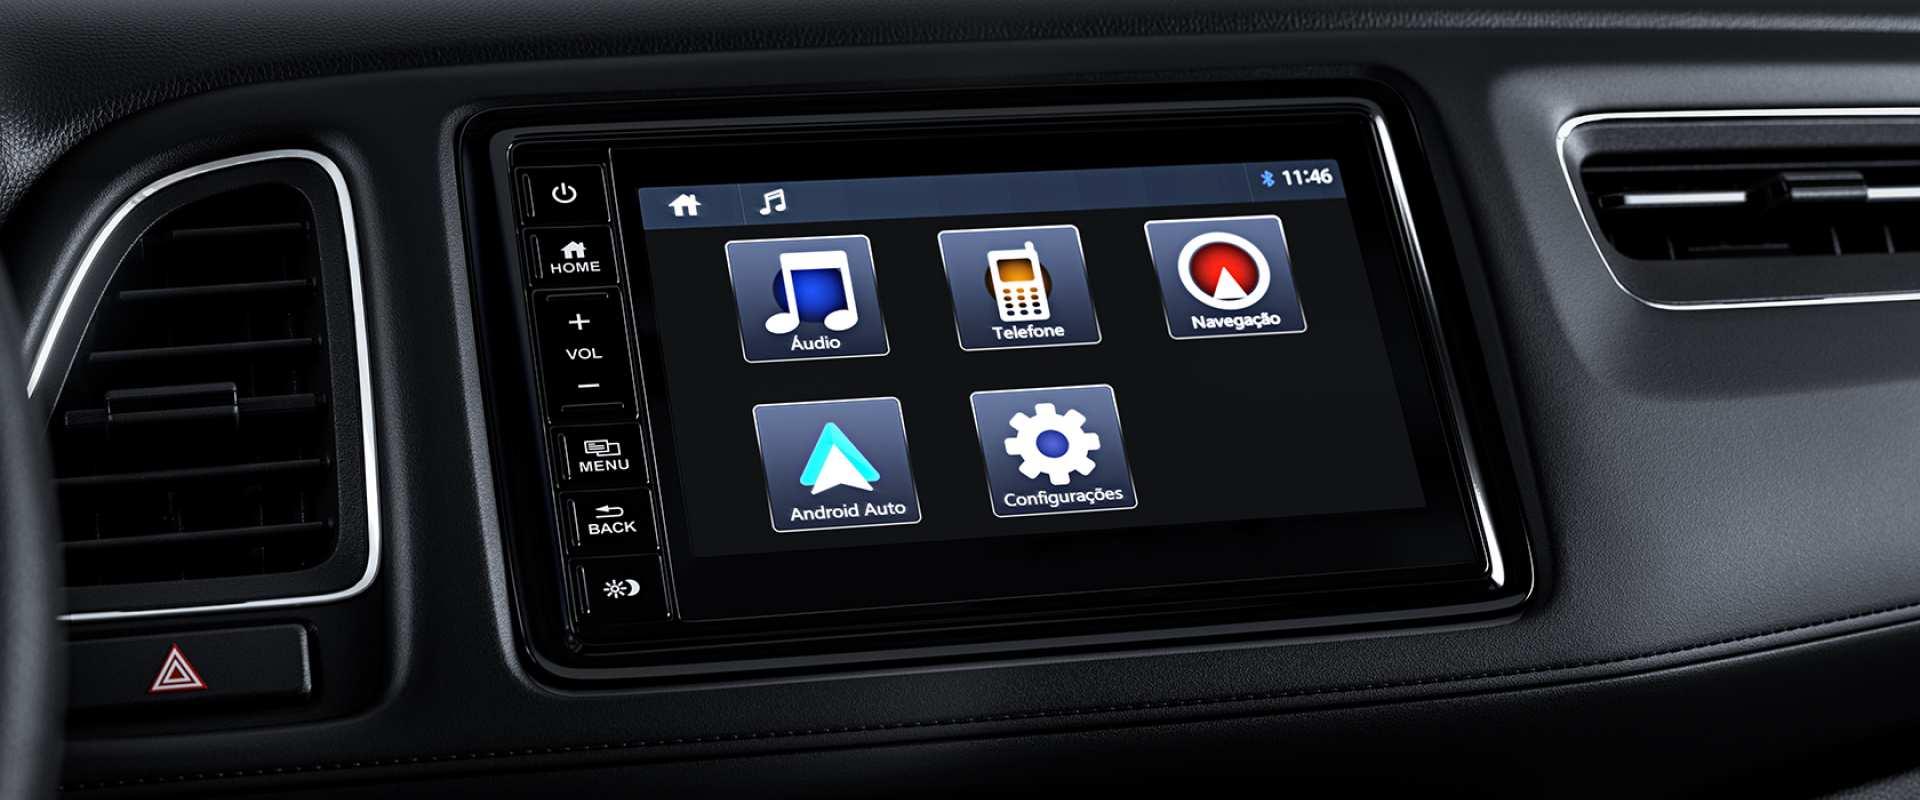 "Multimídia 7"" com tela multi-touchscreen"